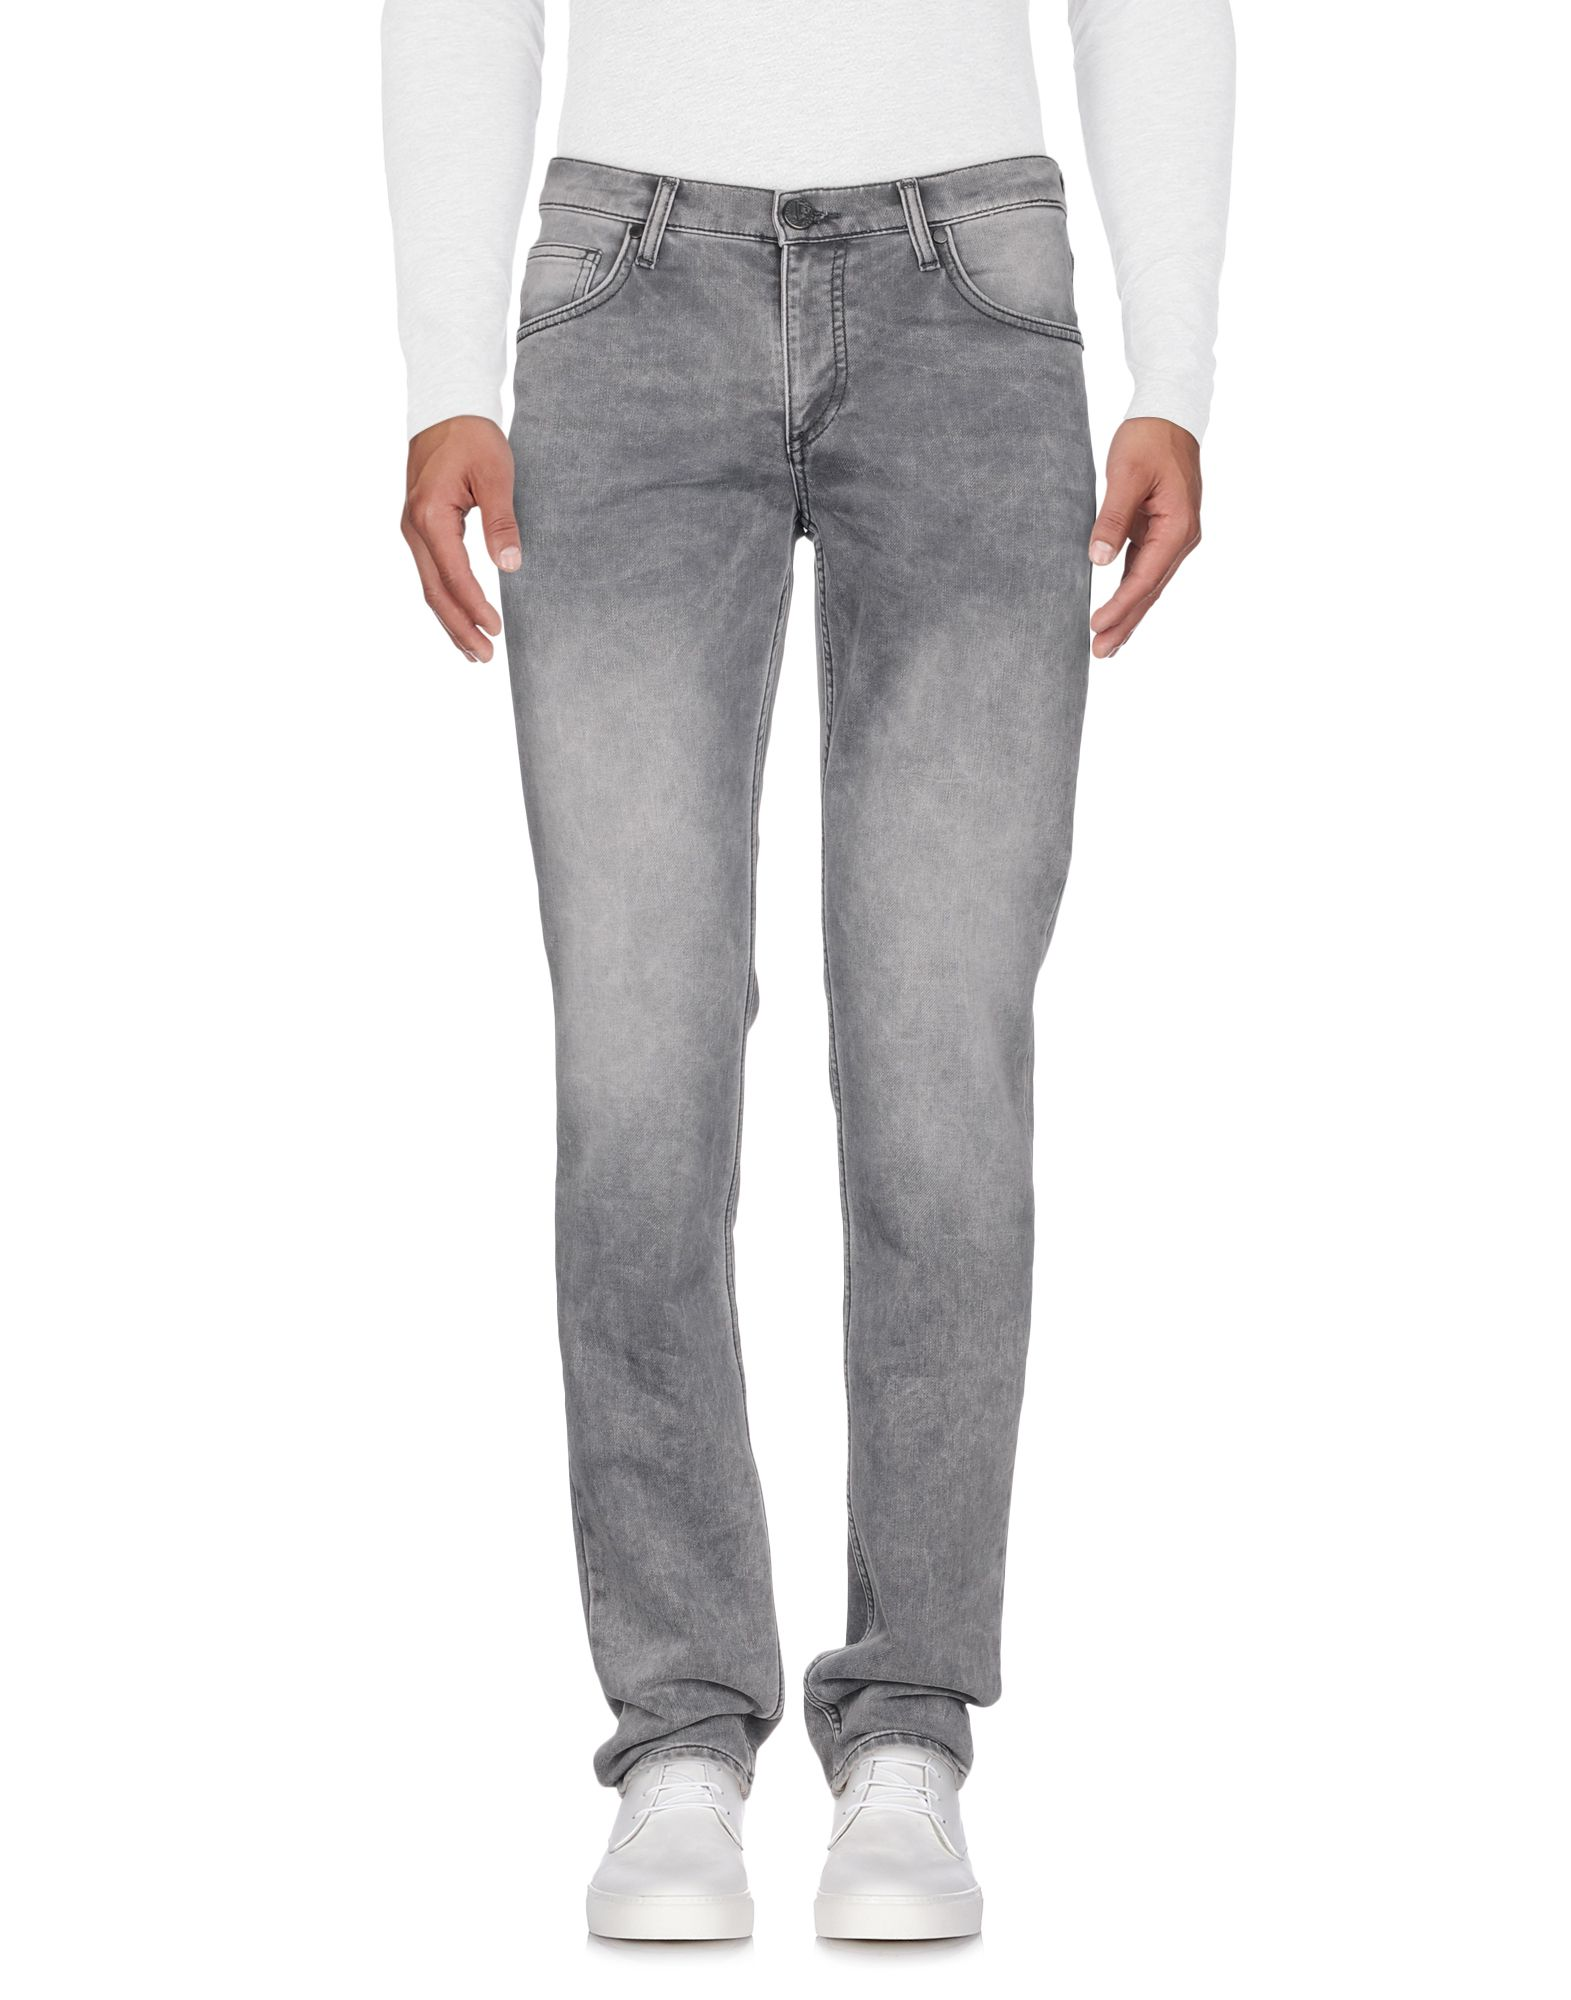 b2bc4a9ba1 Pantaloni Jeans Versace Jeans Uomo - 42682581OC oumwjd514-VERSACE ...